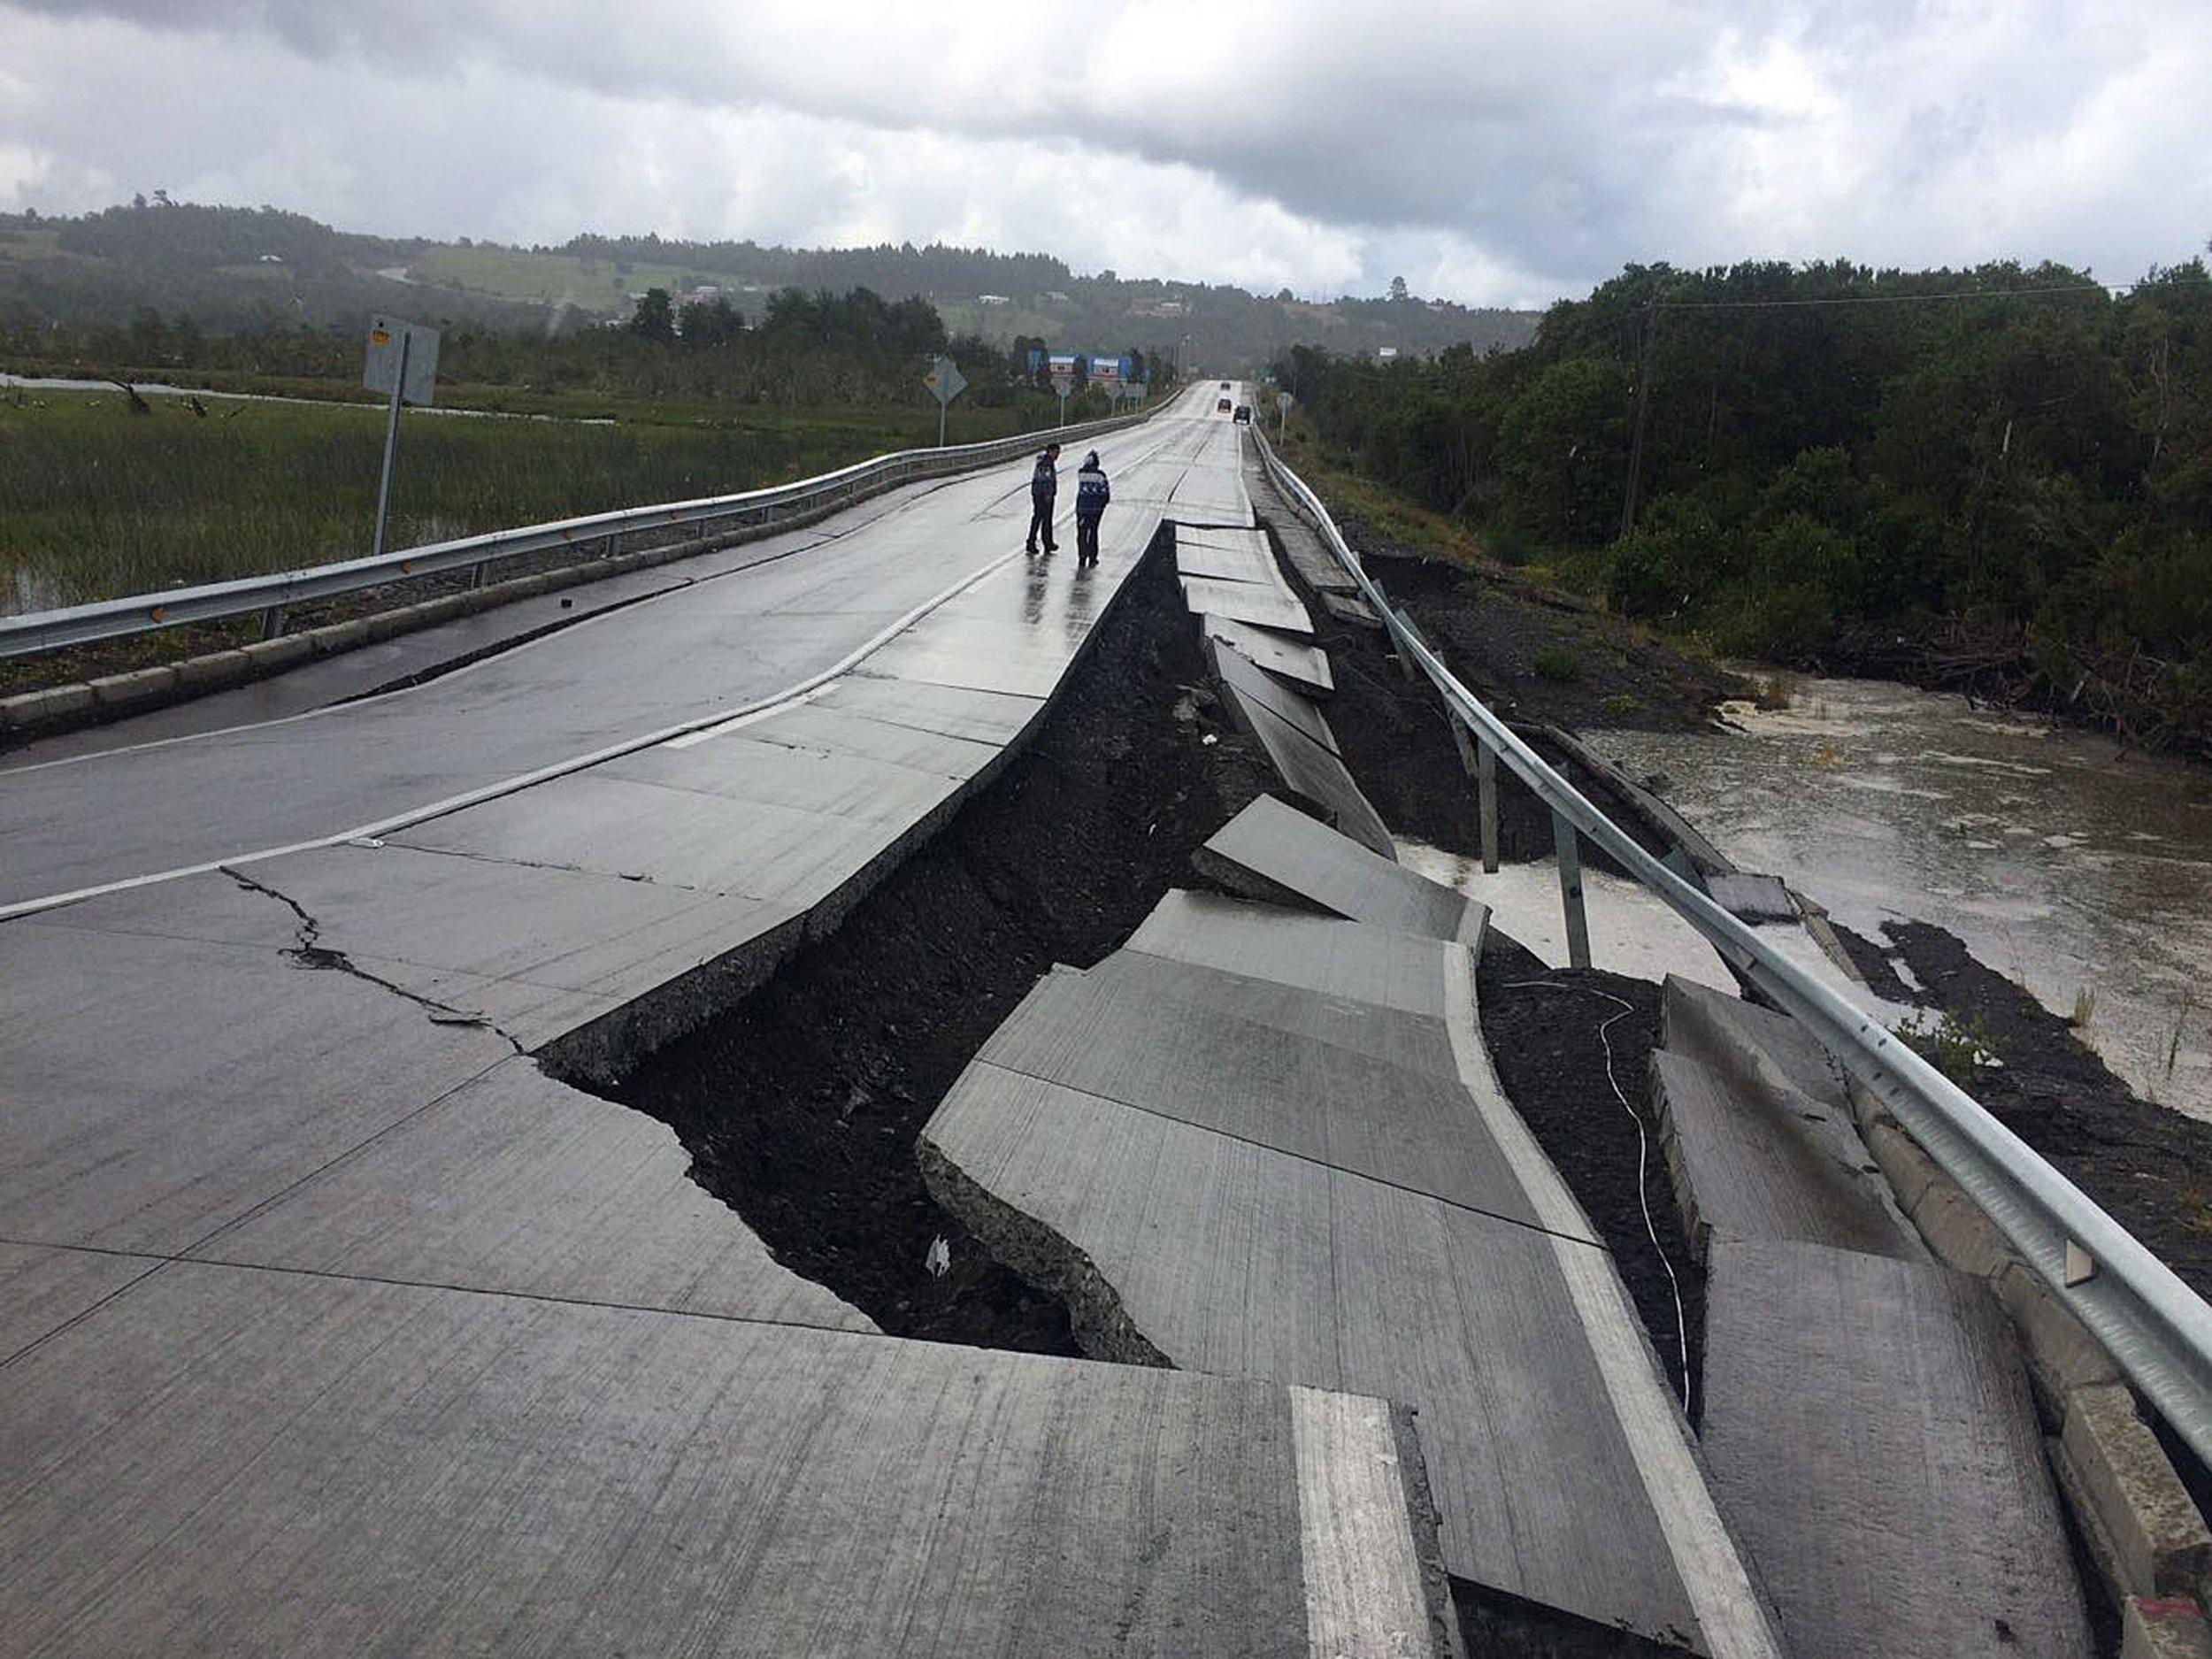 Tsunami warning after massive earthquake strikes off Chile on Christmas Day